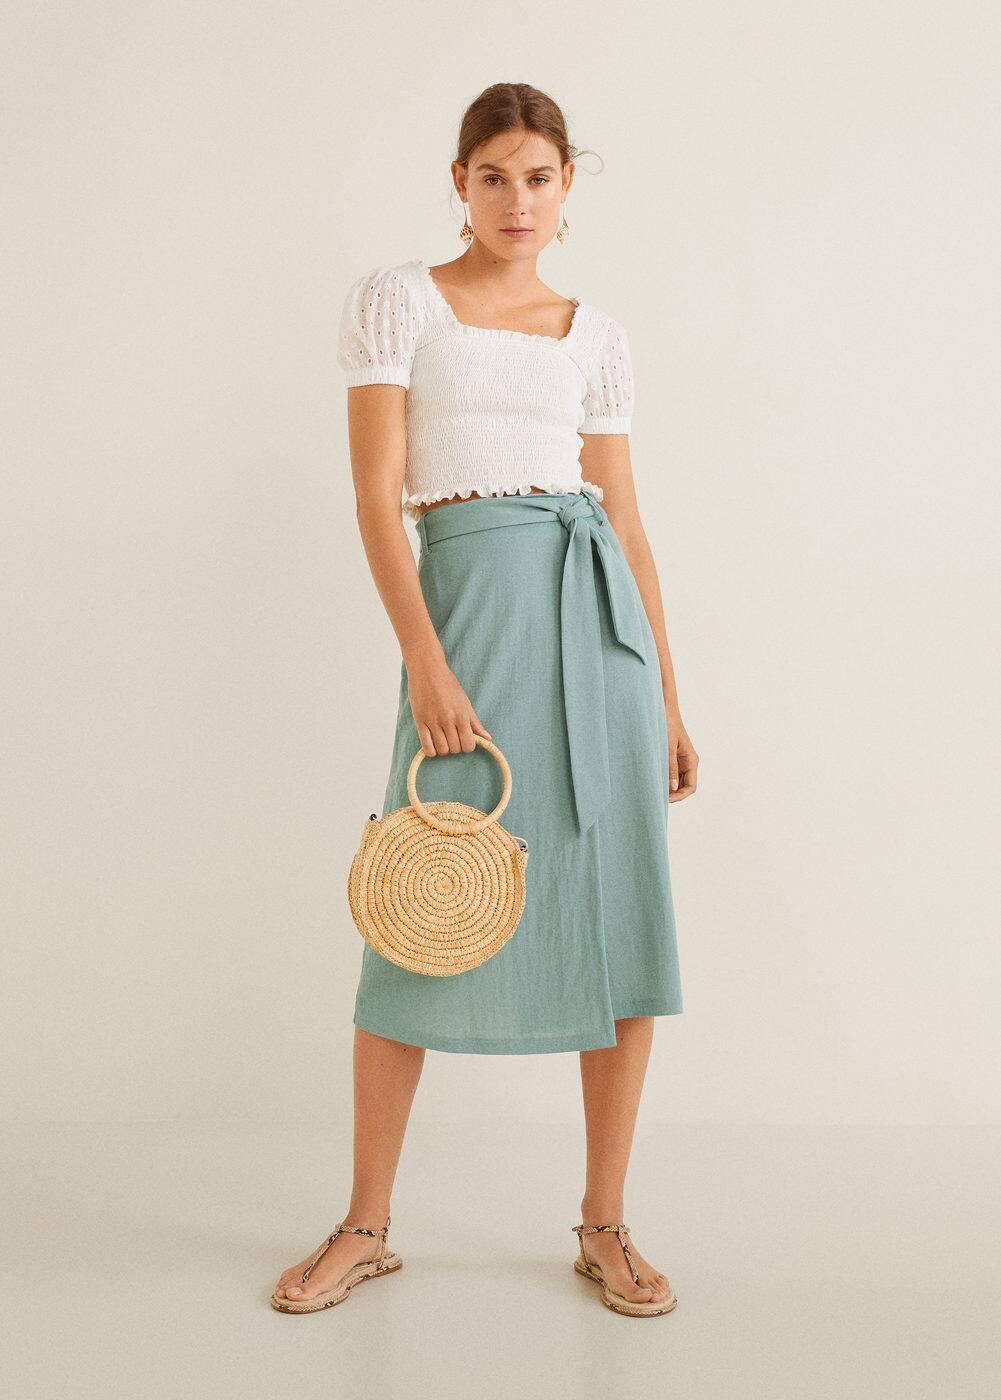 m-blueline:falda cruzada lazo